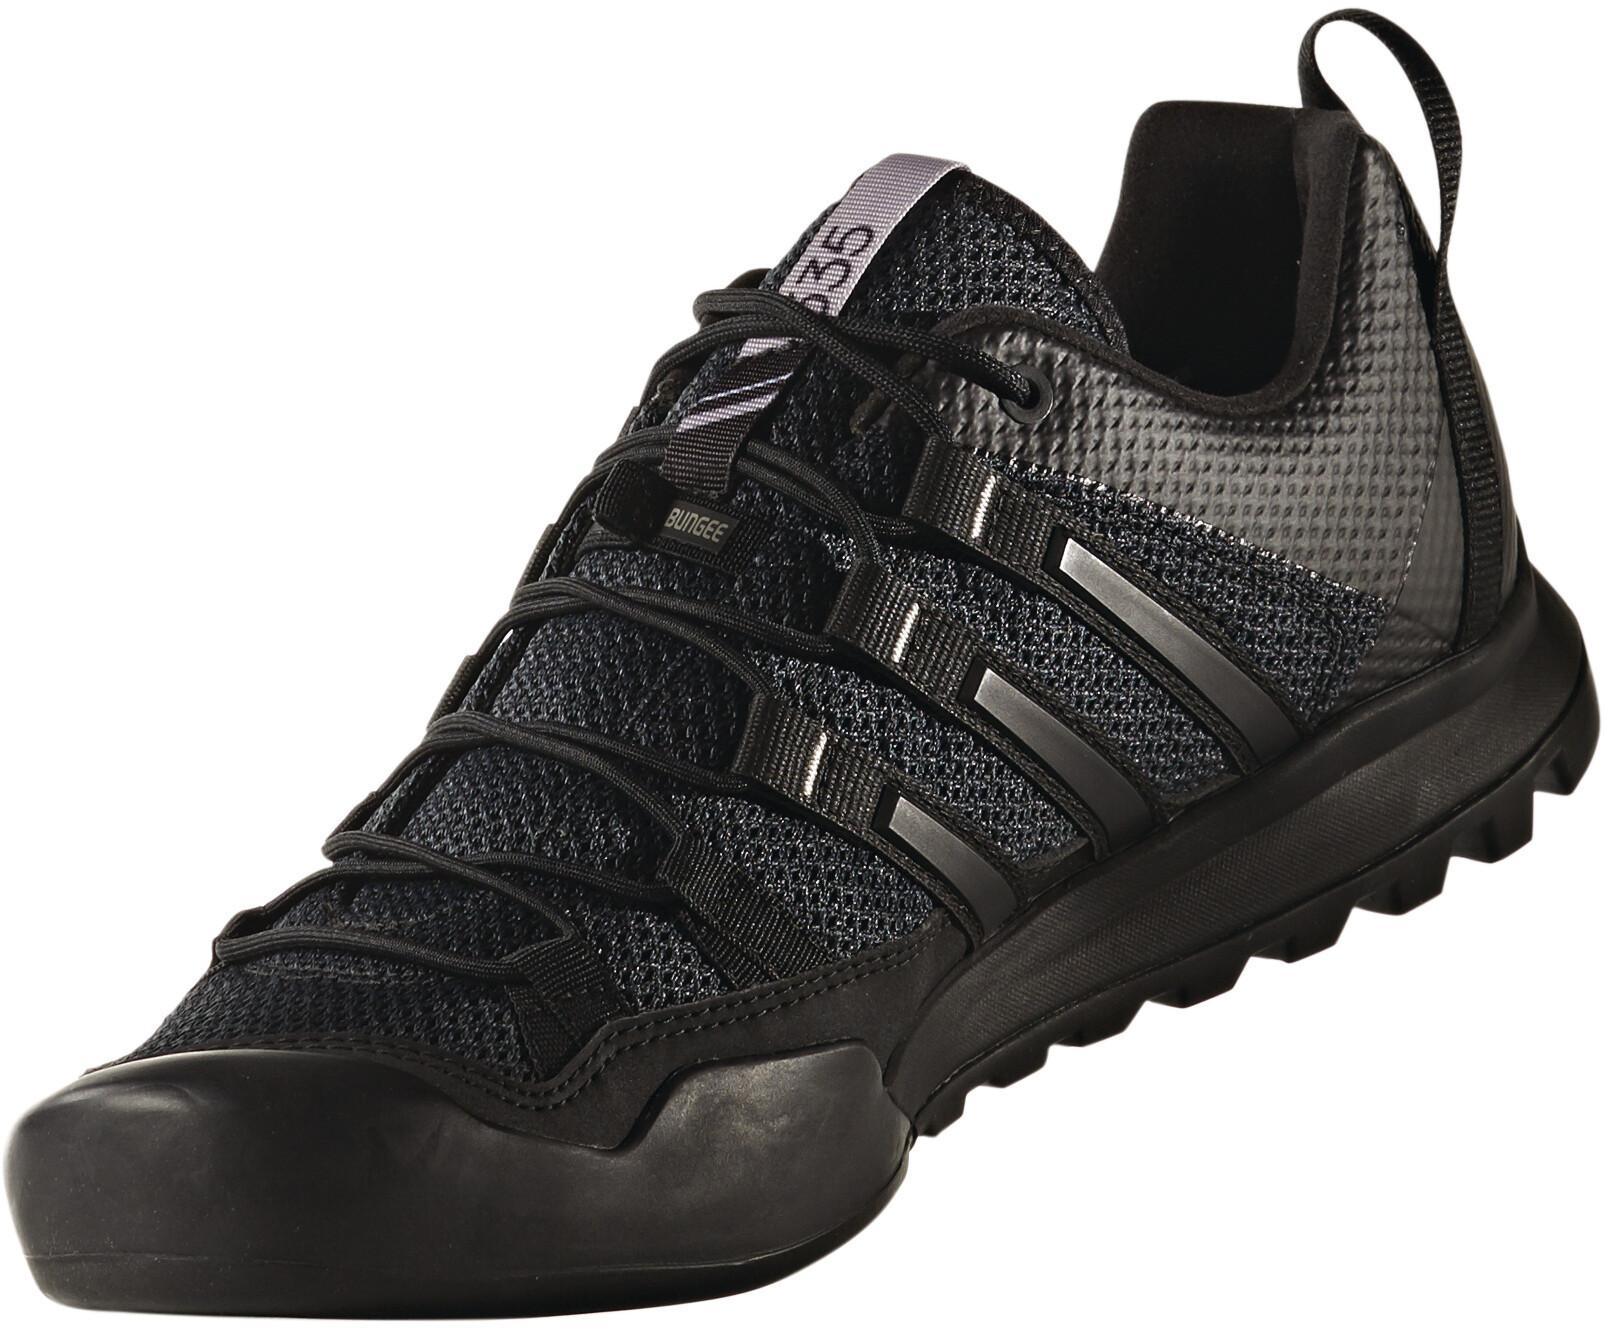 new style 34276 2c7fb adidas TERREX Solo Shoes Men grey black